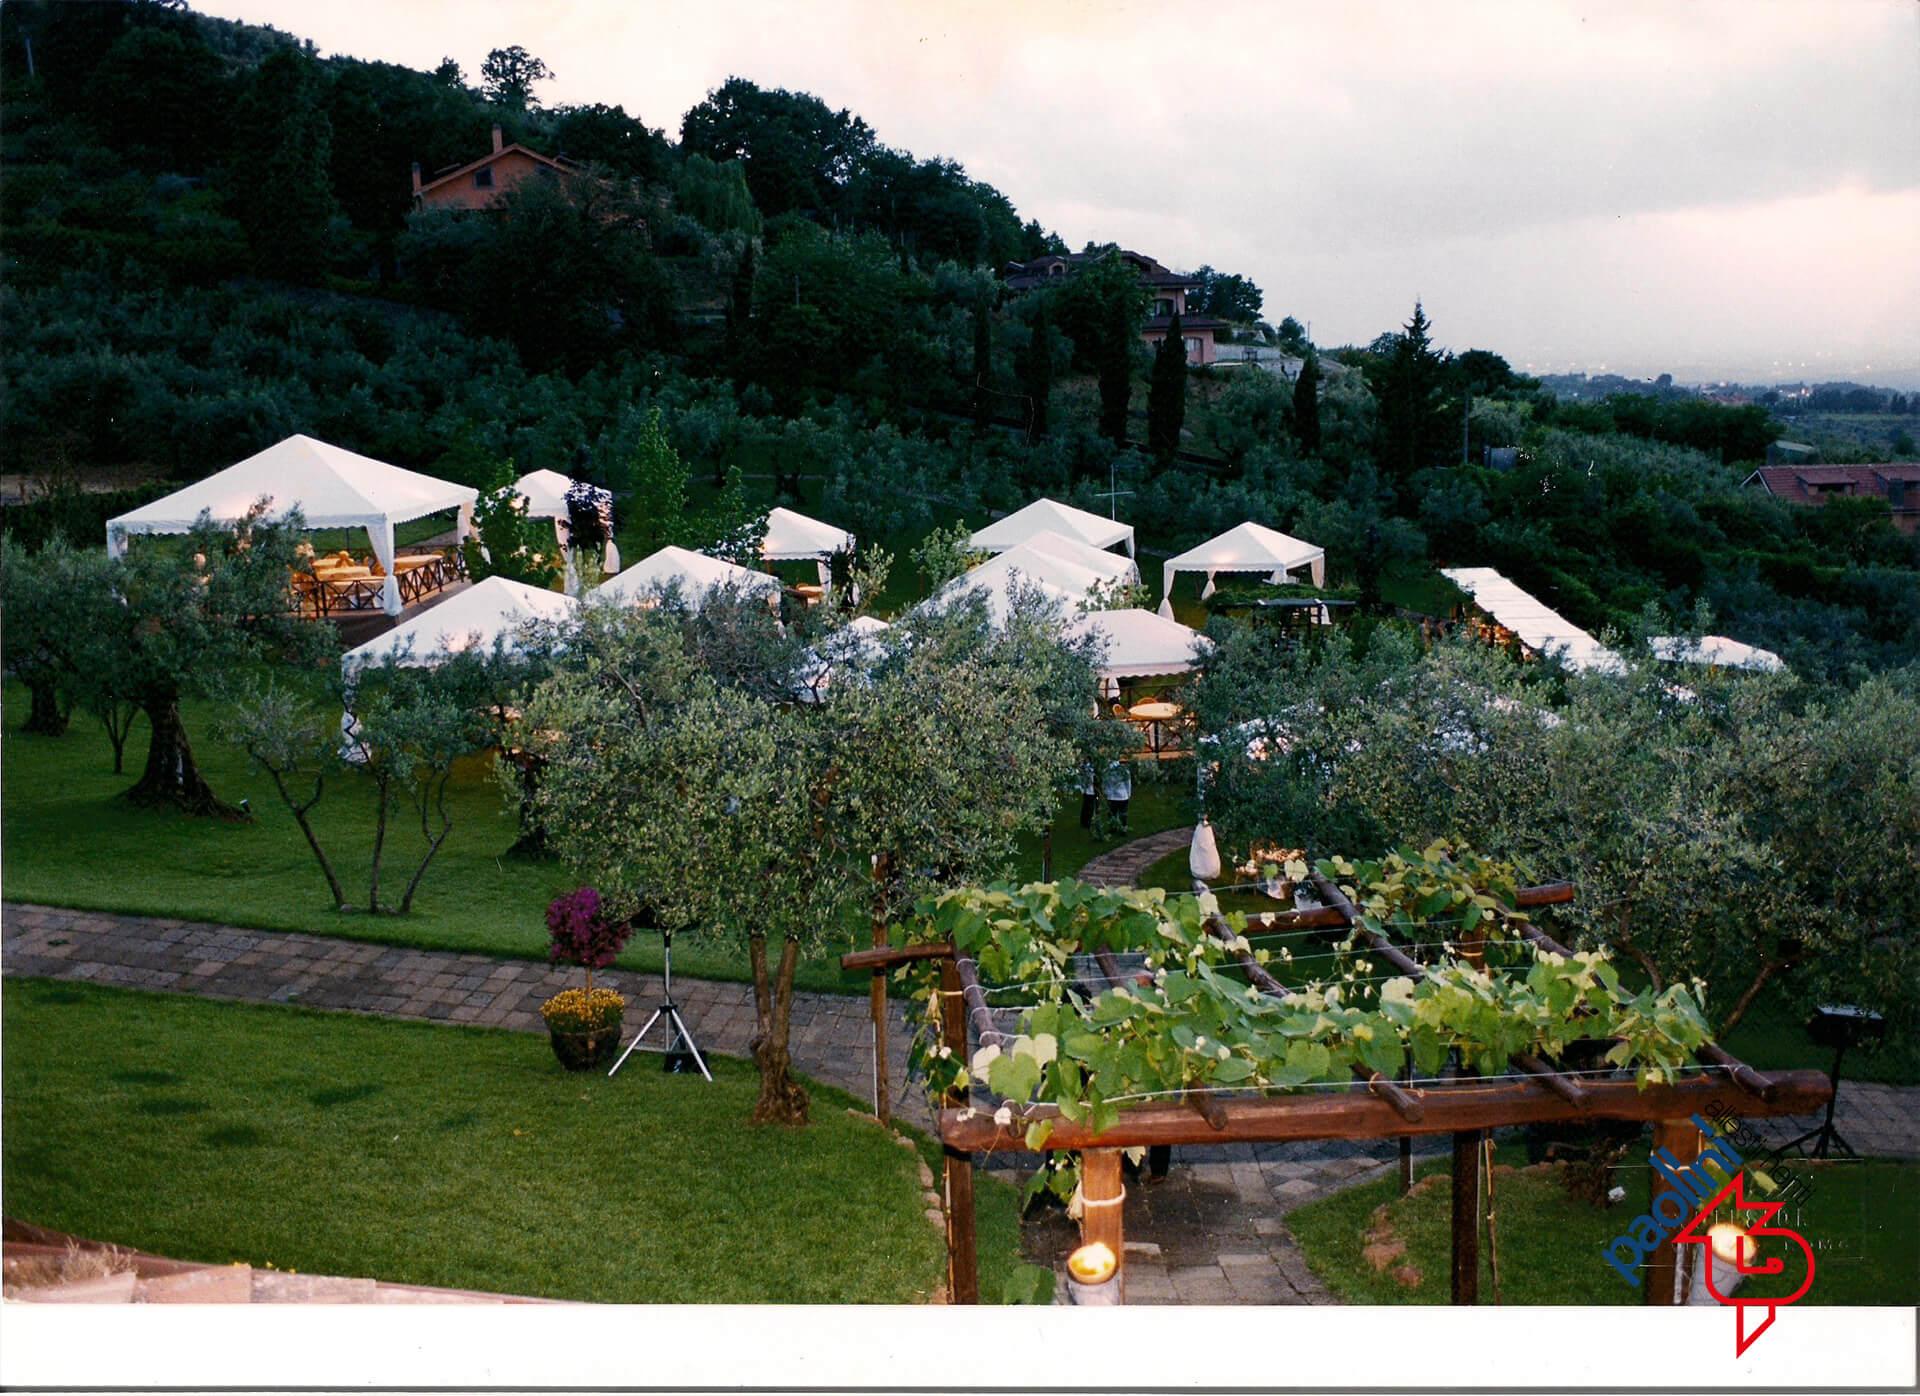 Noleggio gazebo roma gazebo per feste e matrimoni for Paolini tensostrutture